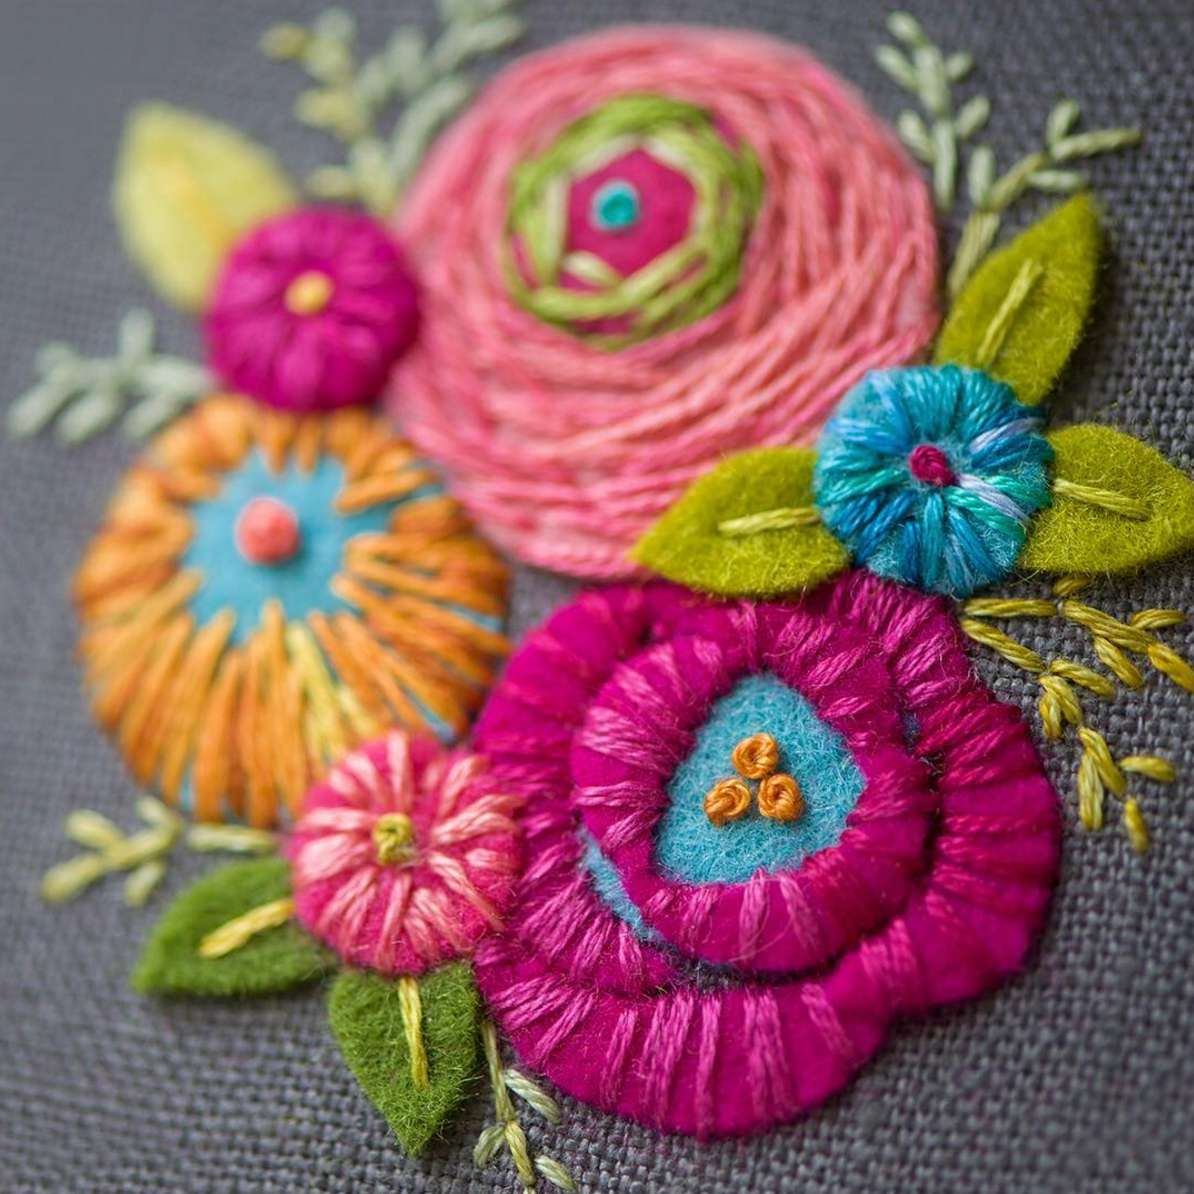 Felt Floral Displays